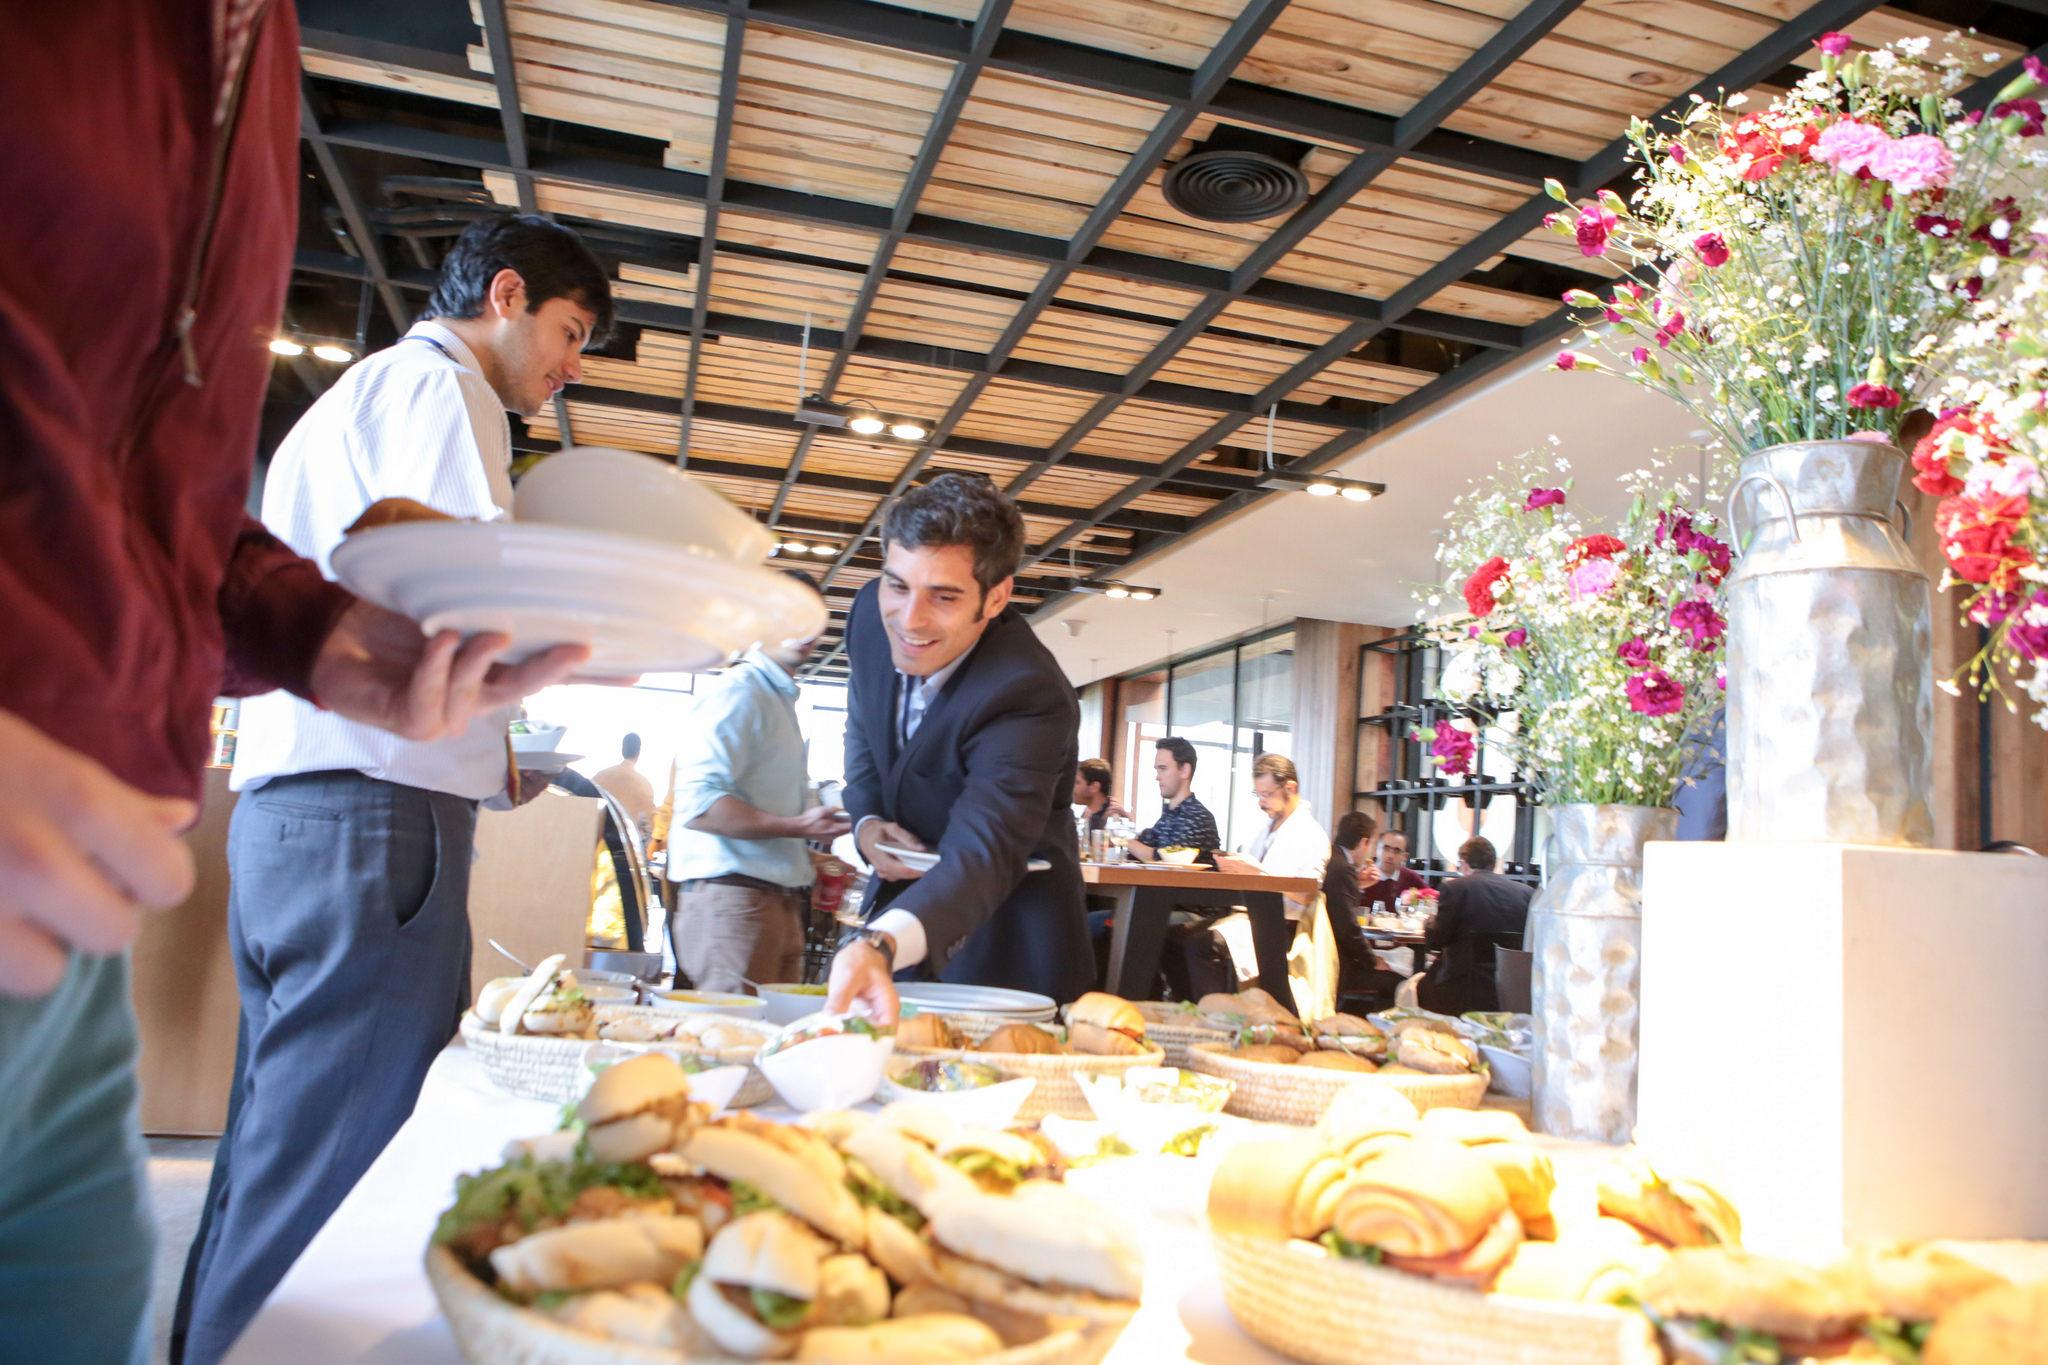 C mo saber si un restaurante est triunfando el blog de for Como disenar un restaurante